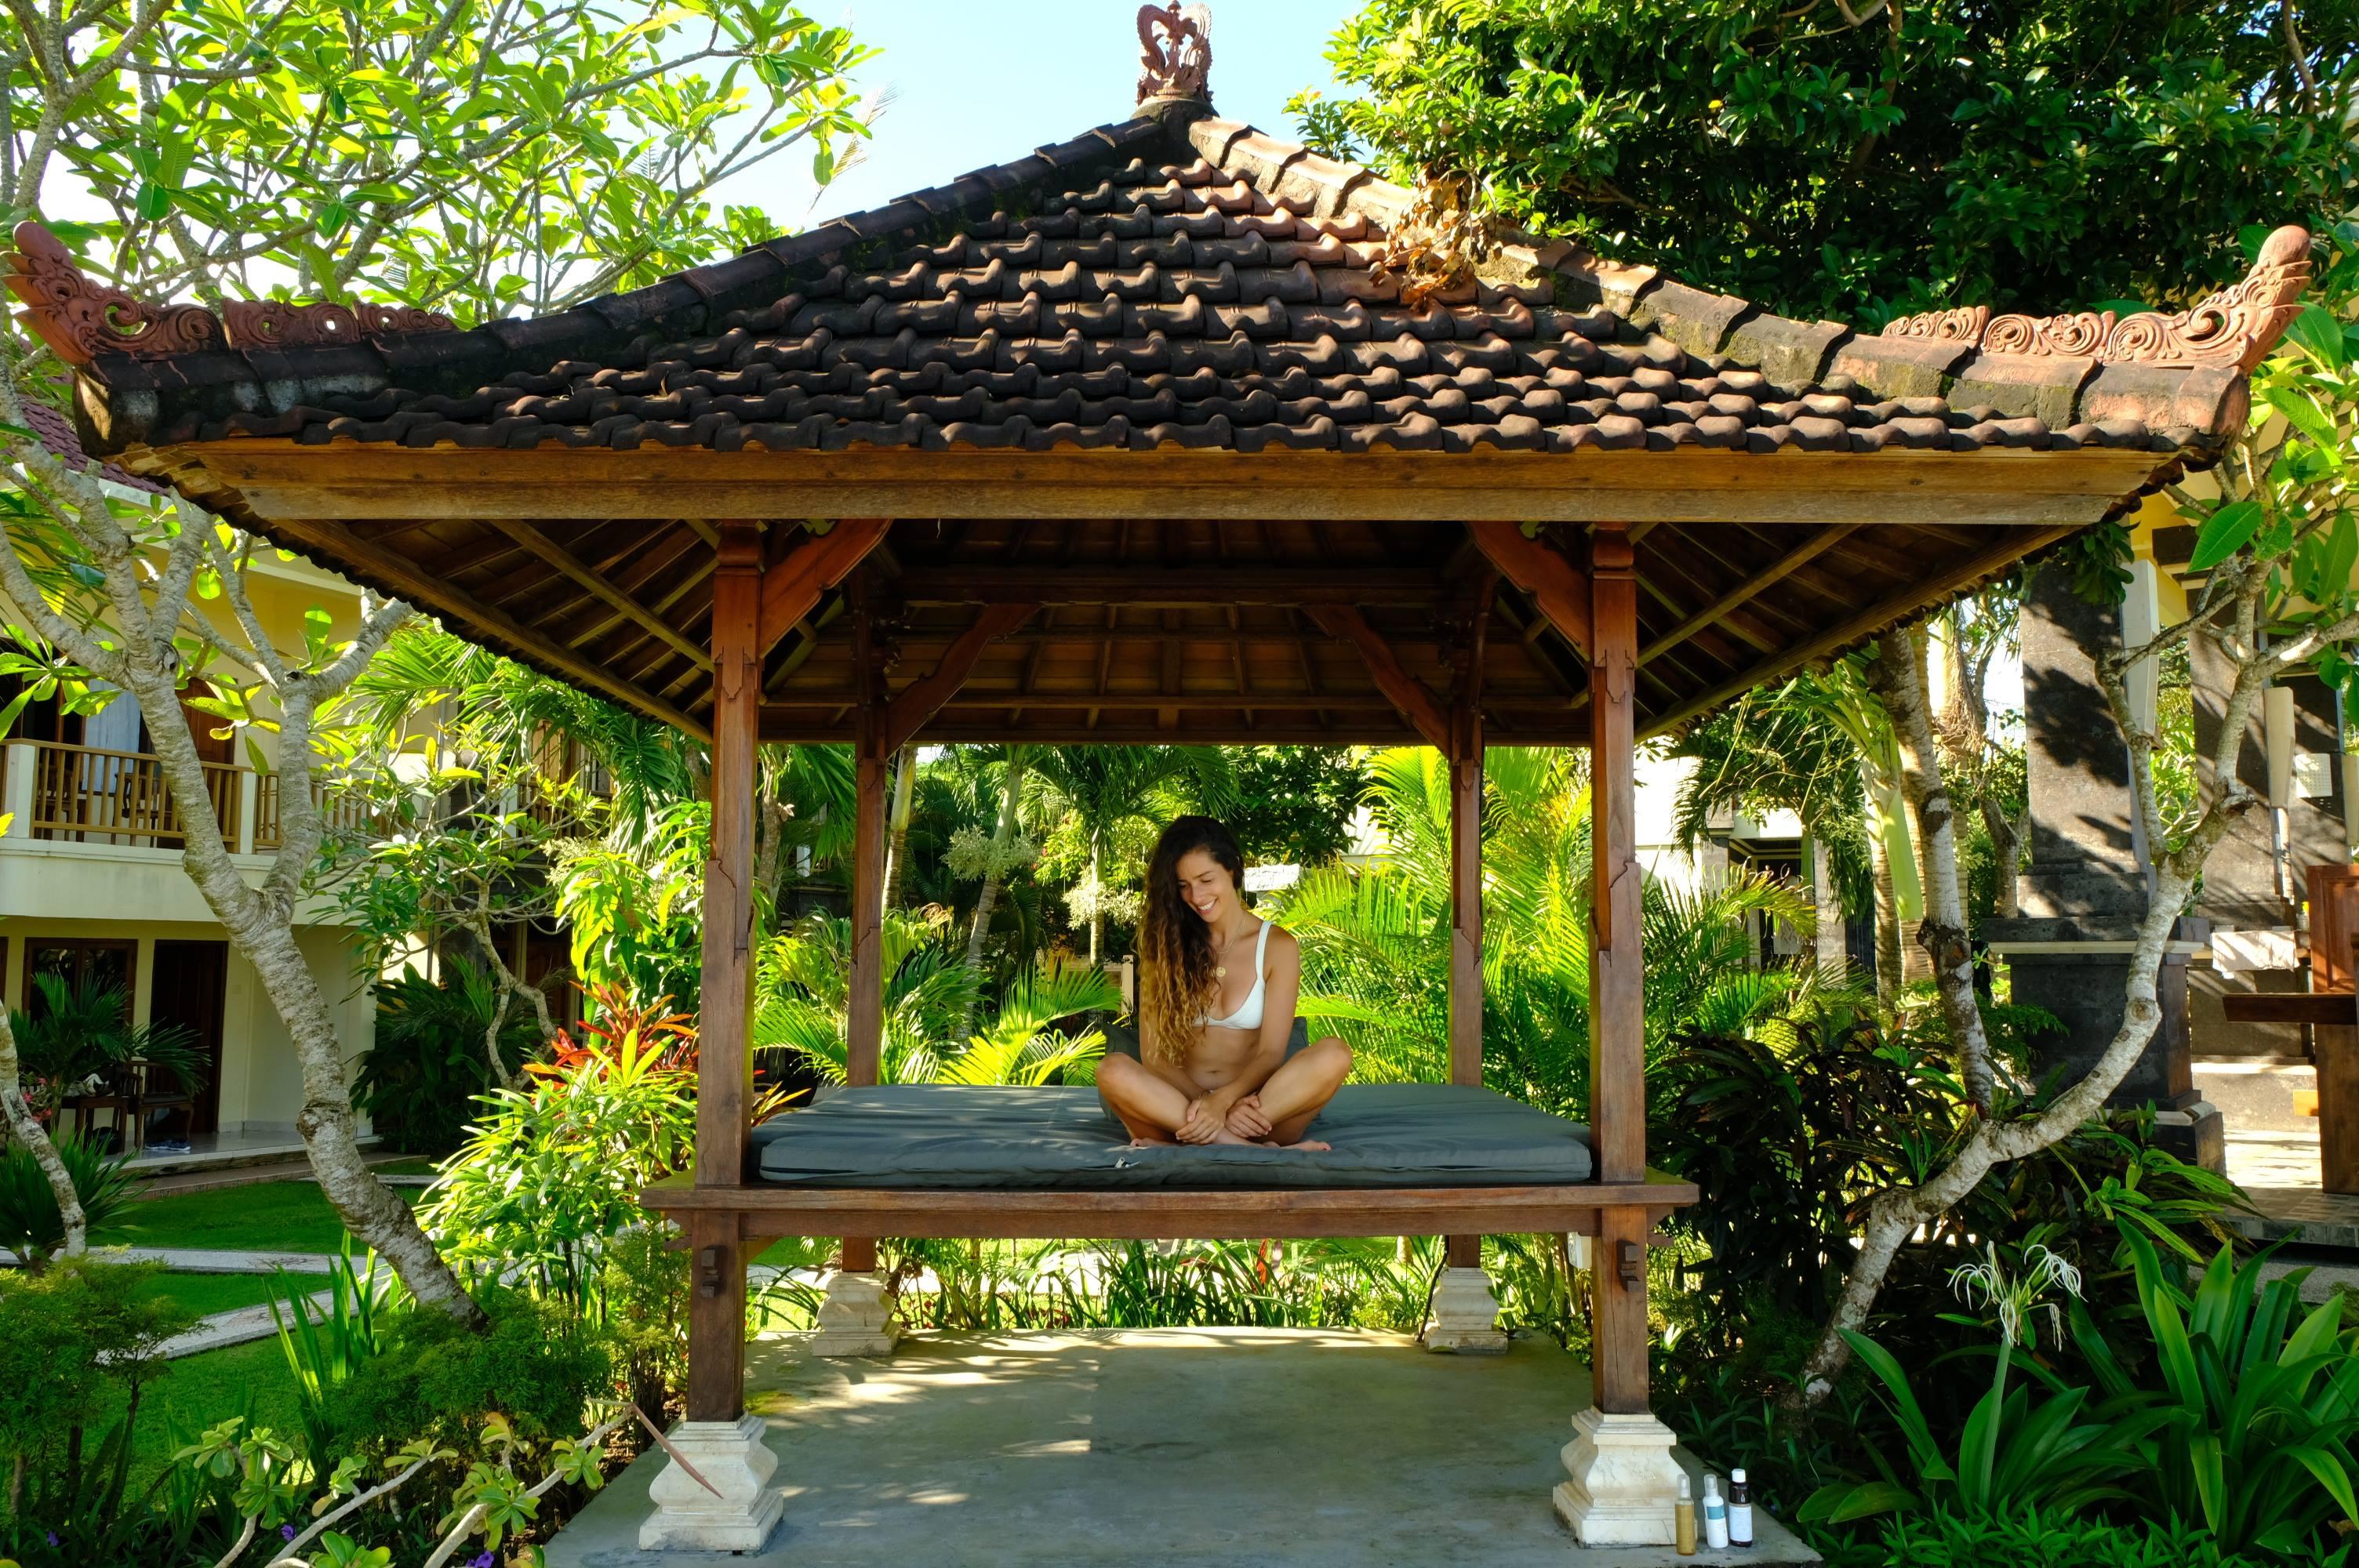 compte rendu de ma formation de 200hrs de yoga a Bali